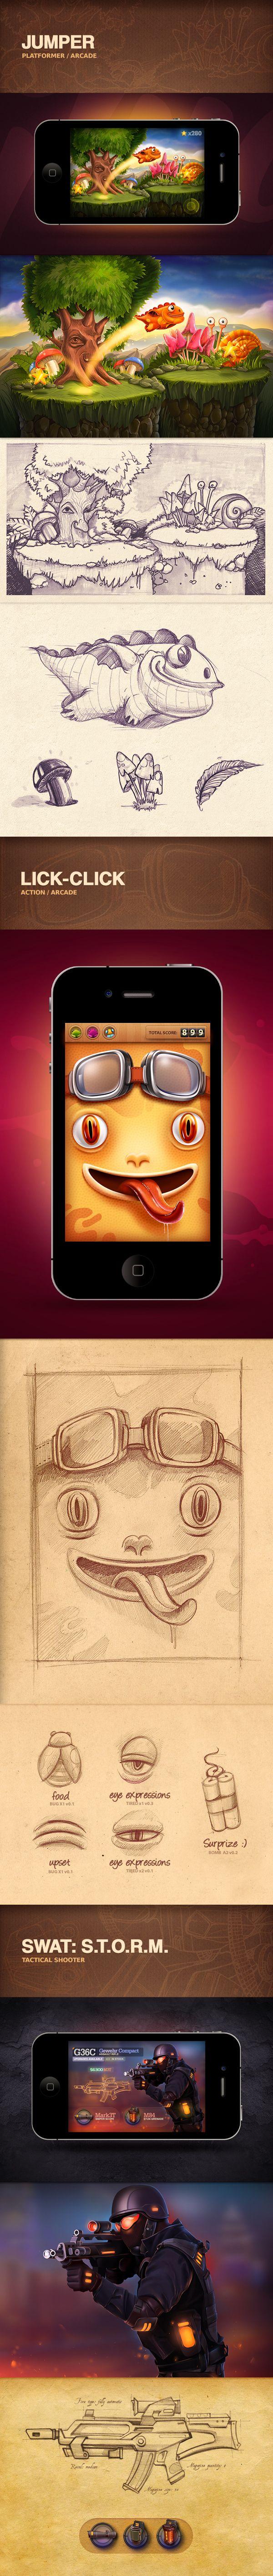 Portfolio 2012-2013 | iOS Games by Mike, via Behance